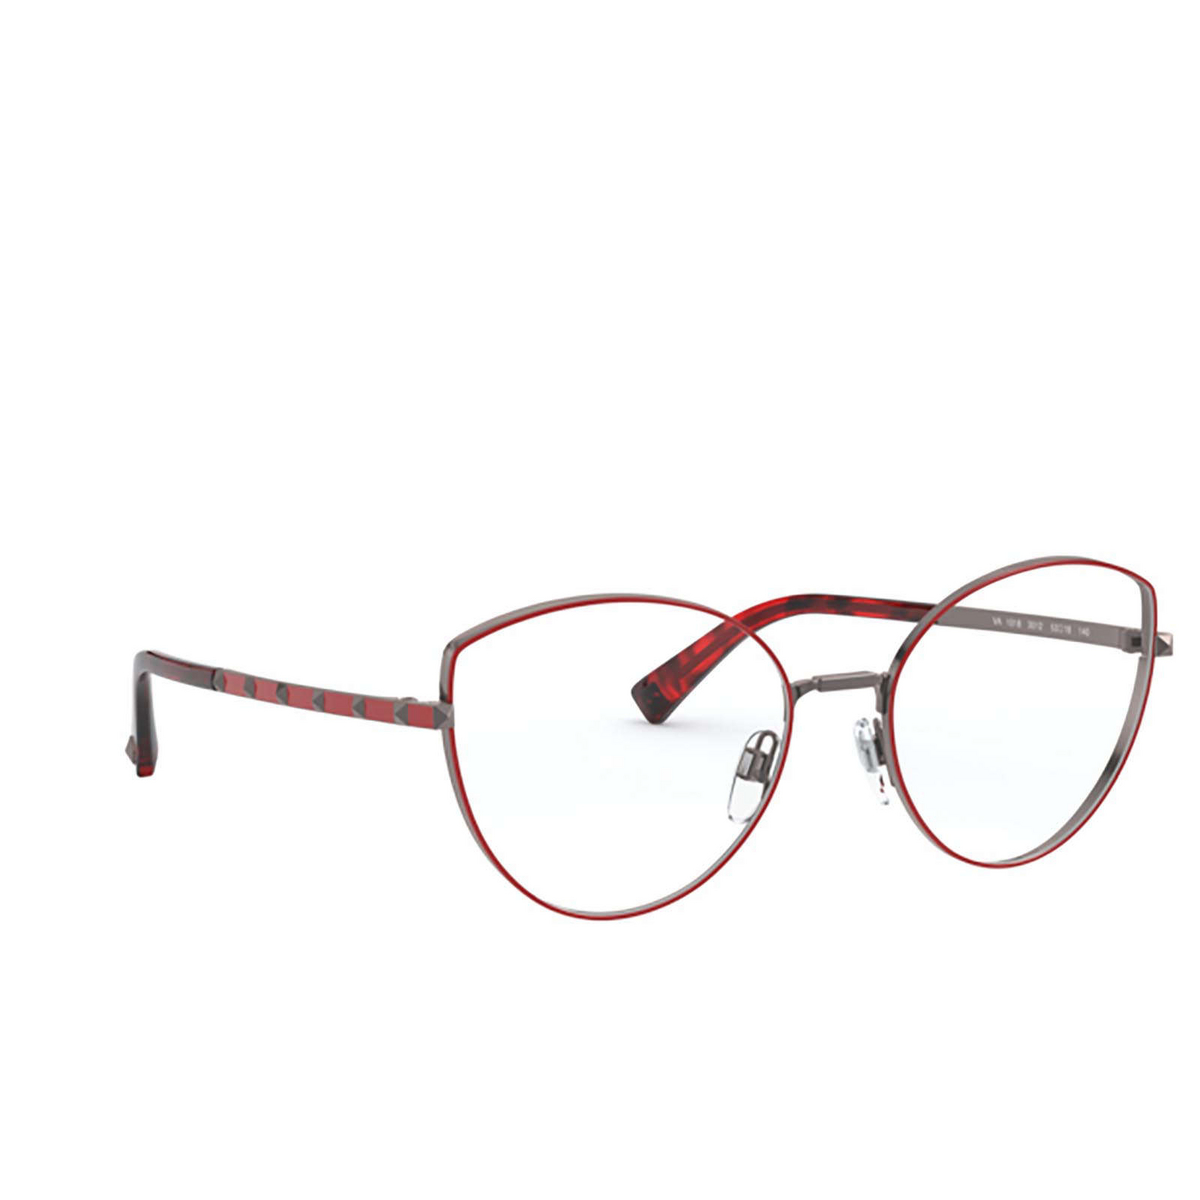 Valentino® Cat-eye Eyeglasses: VA1018 color Gunmetal / Red 3012 - three-quarters view.